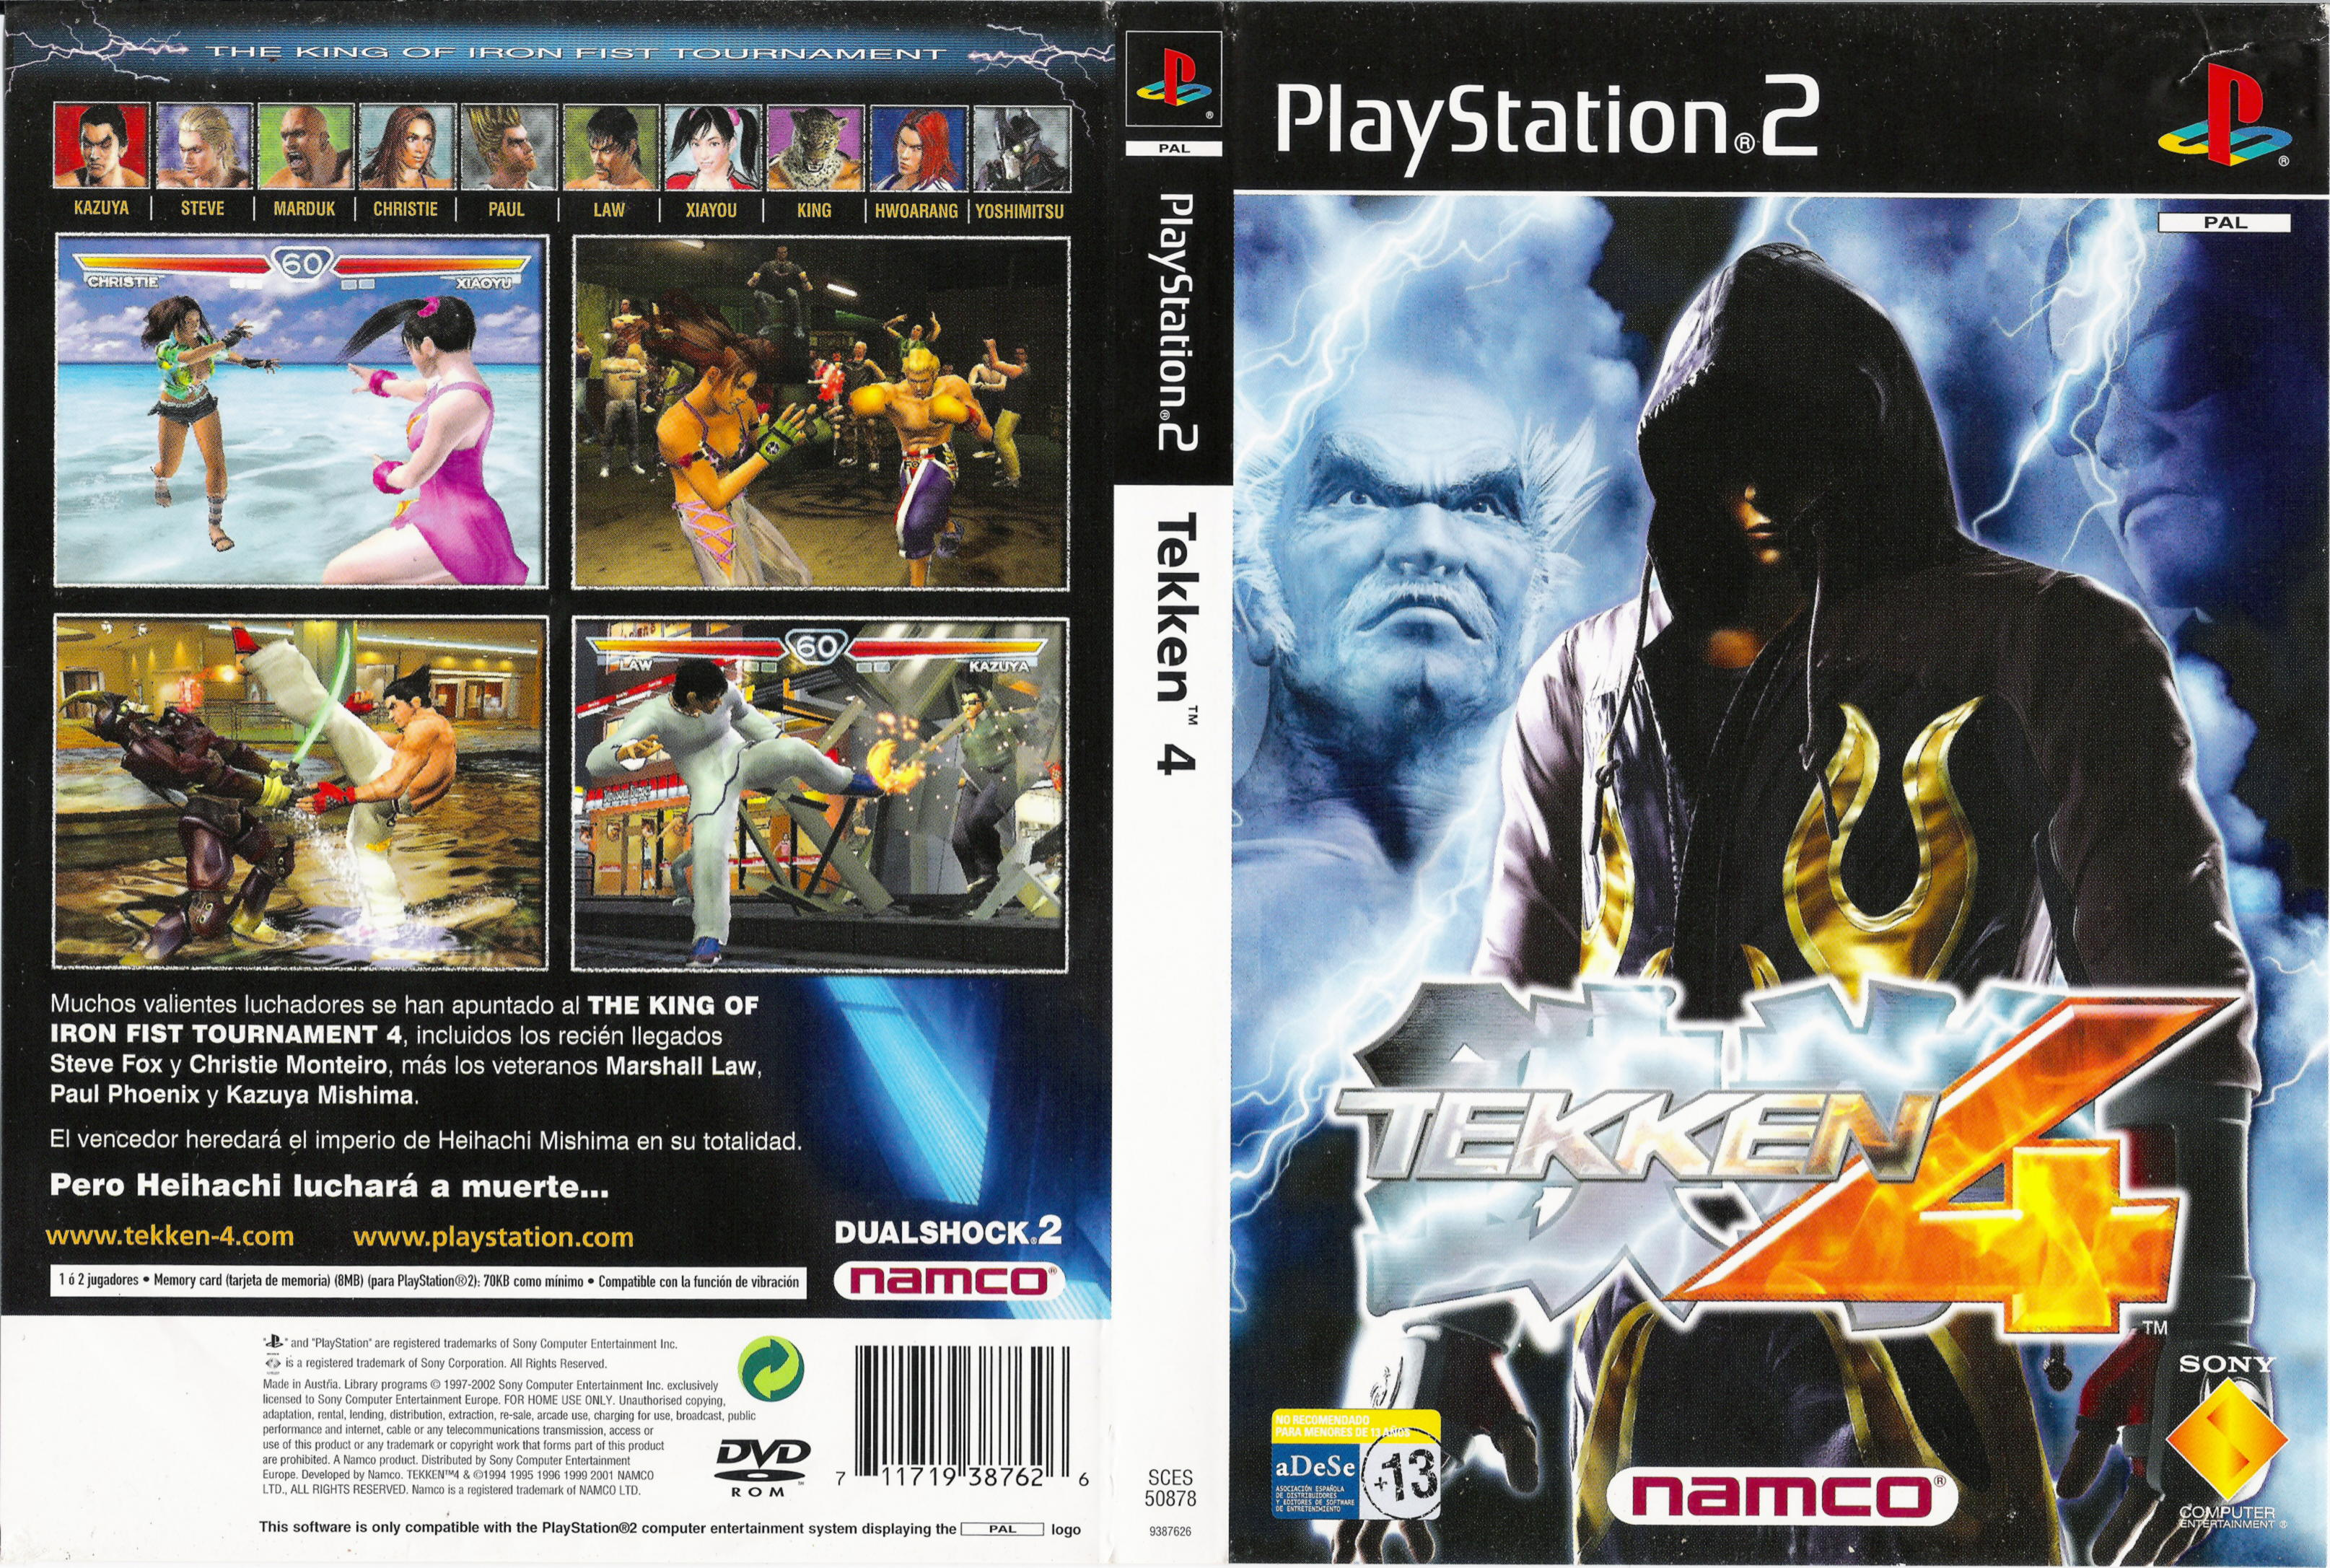 Tekken 4 Cover Caratula Playstation 2 Ps2covers